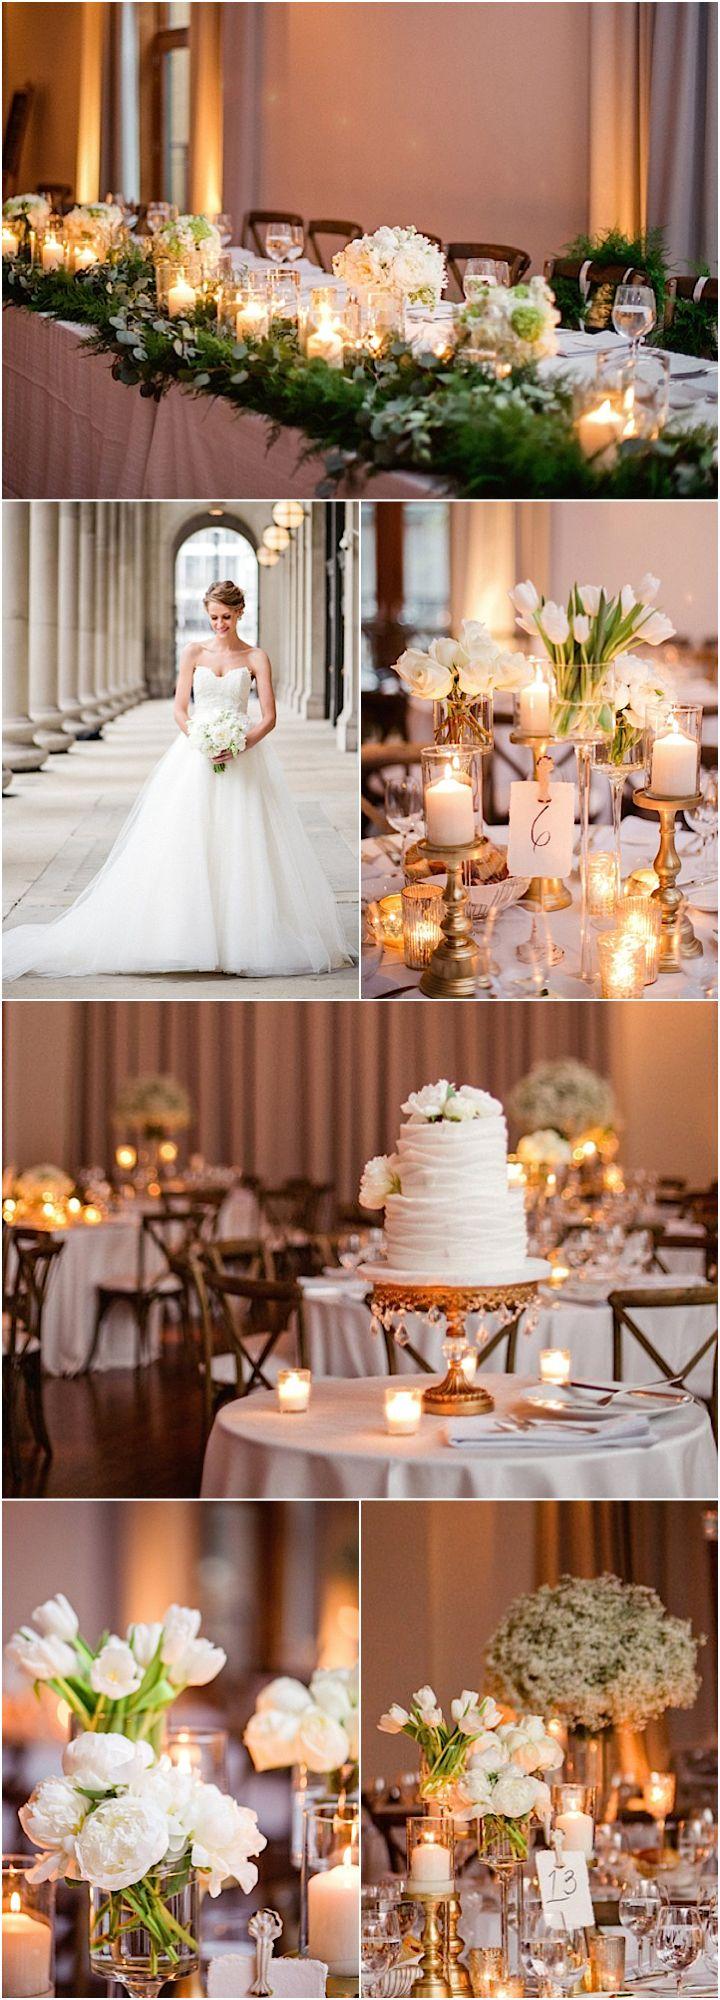 Featured Photographer: Amanda Megan Miller Photography; elegant wedding reception details